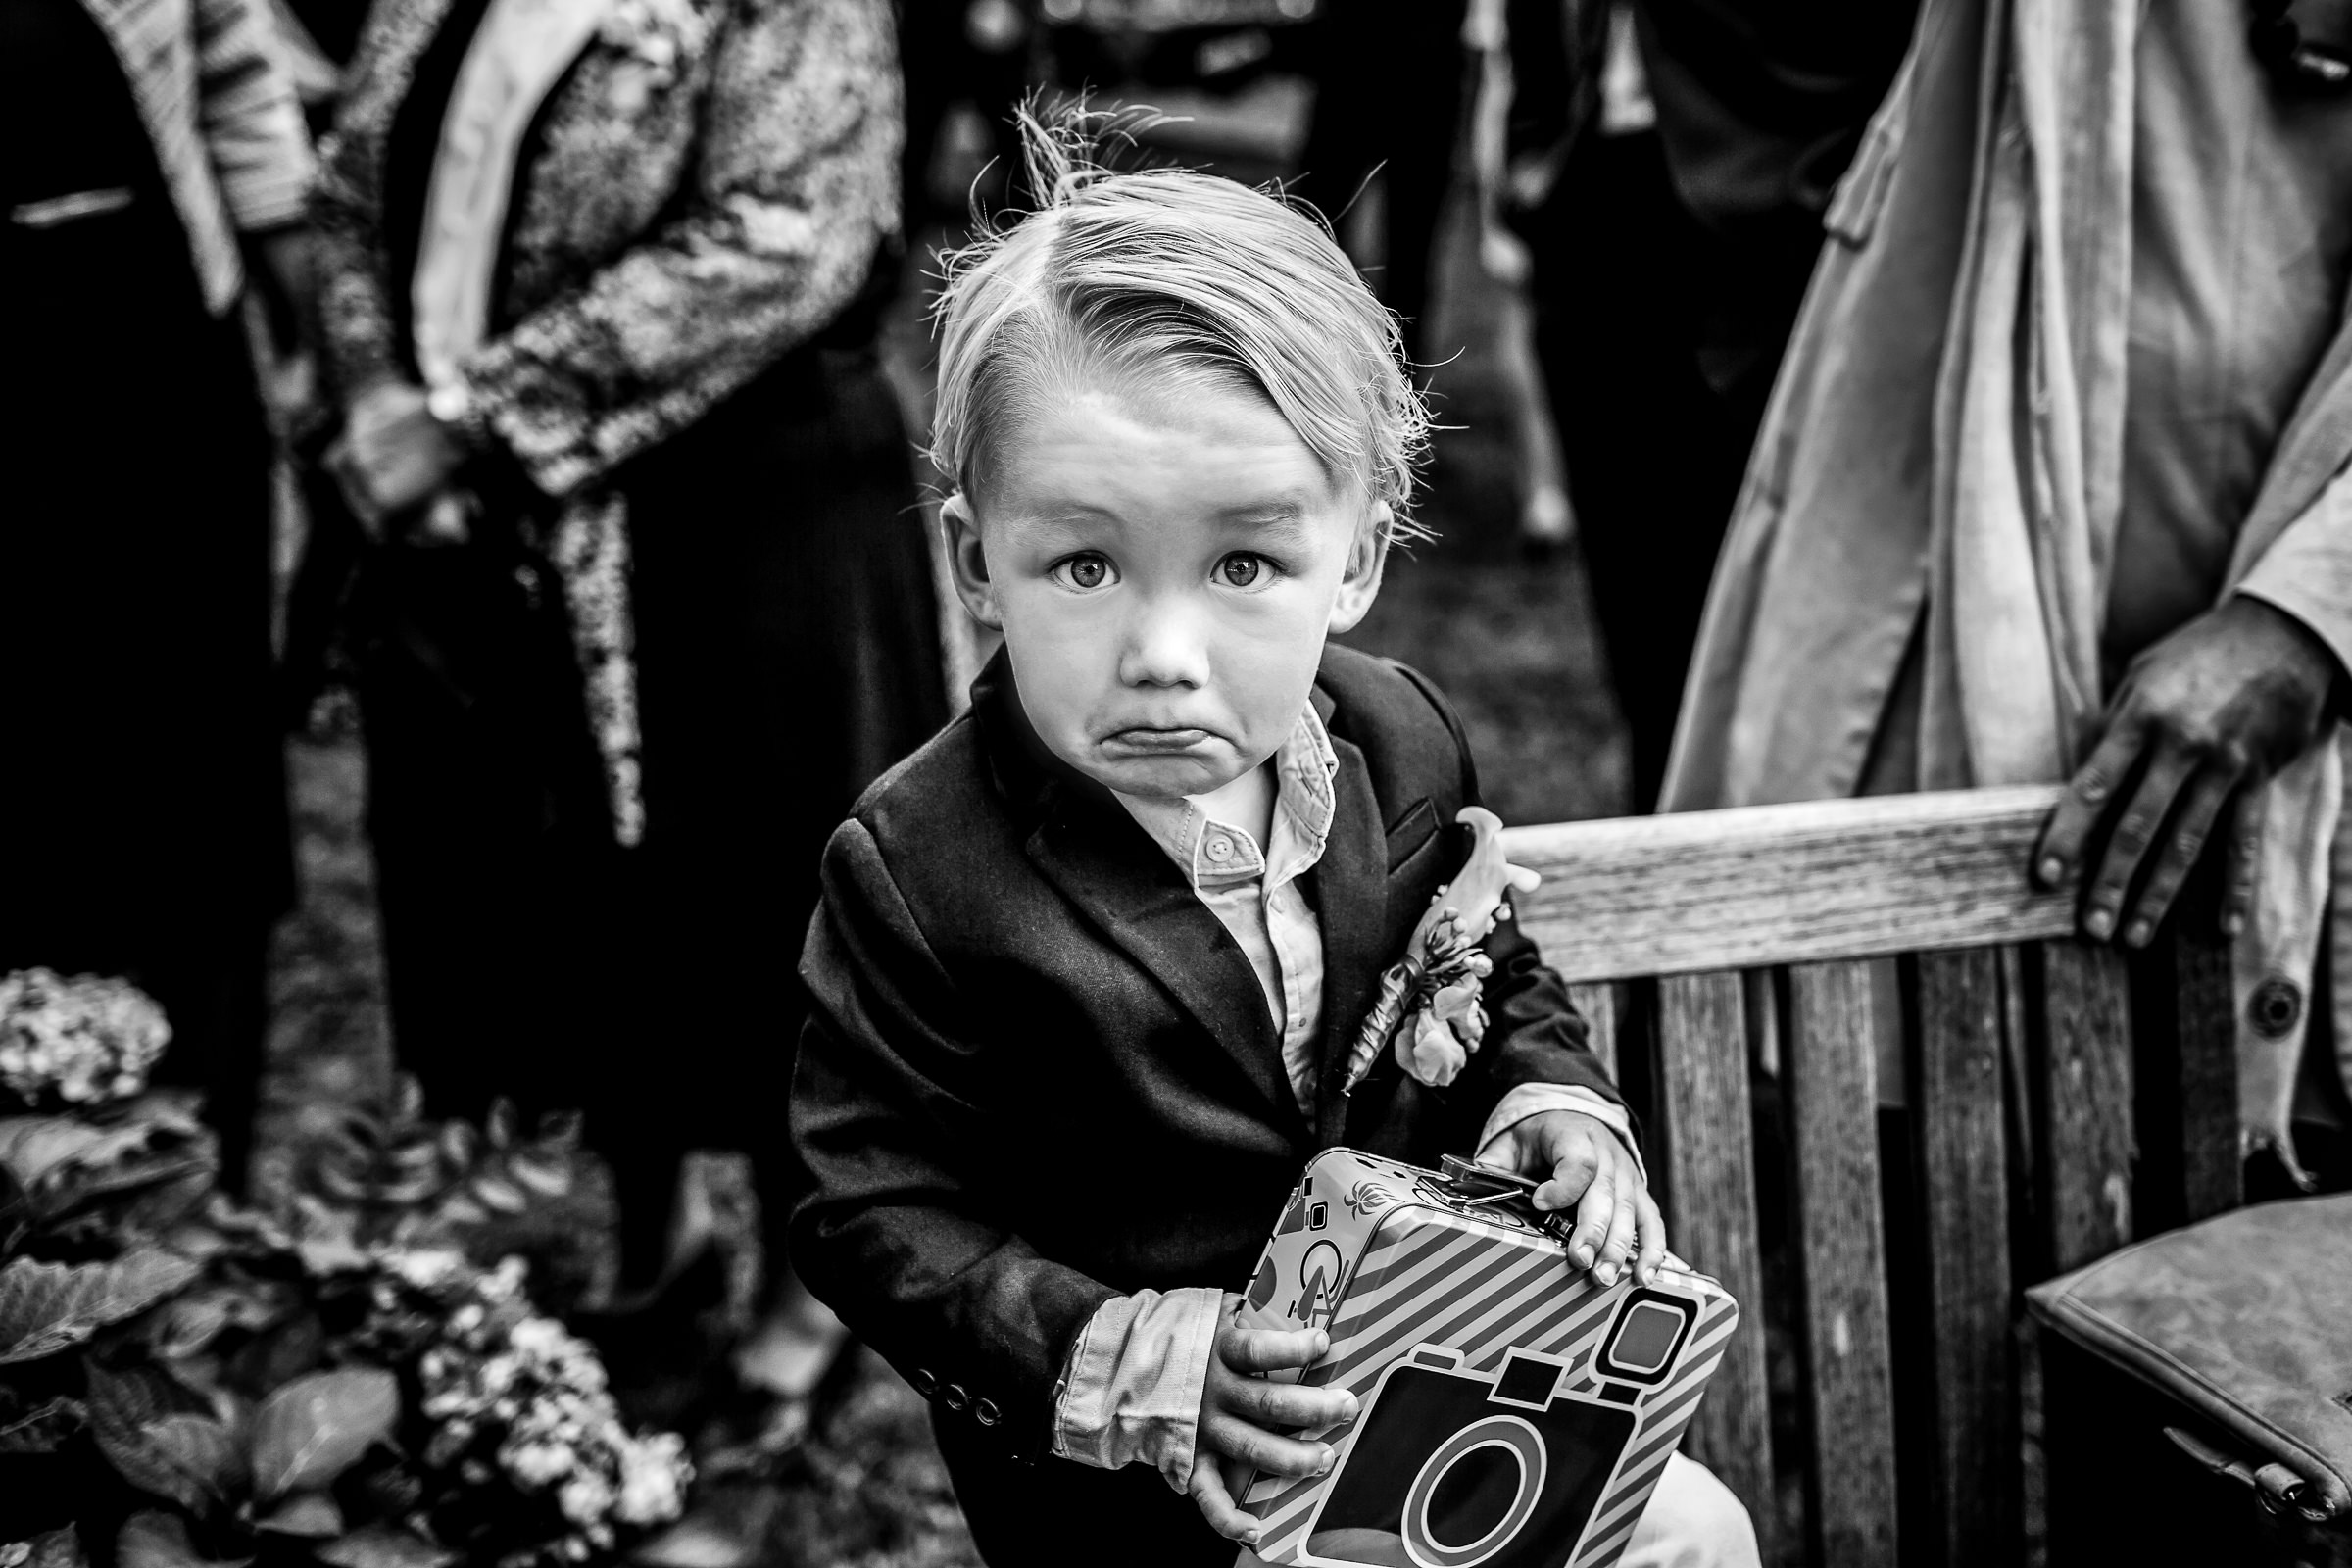 Little boy making a funny face - photo by Peter van der Lingen Wedding Photography